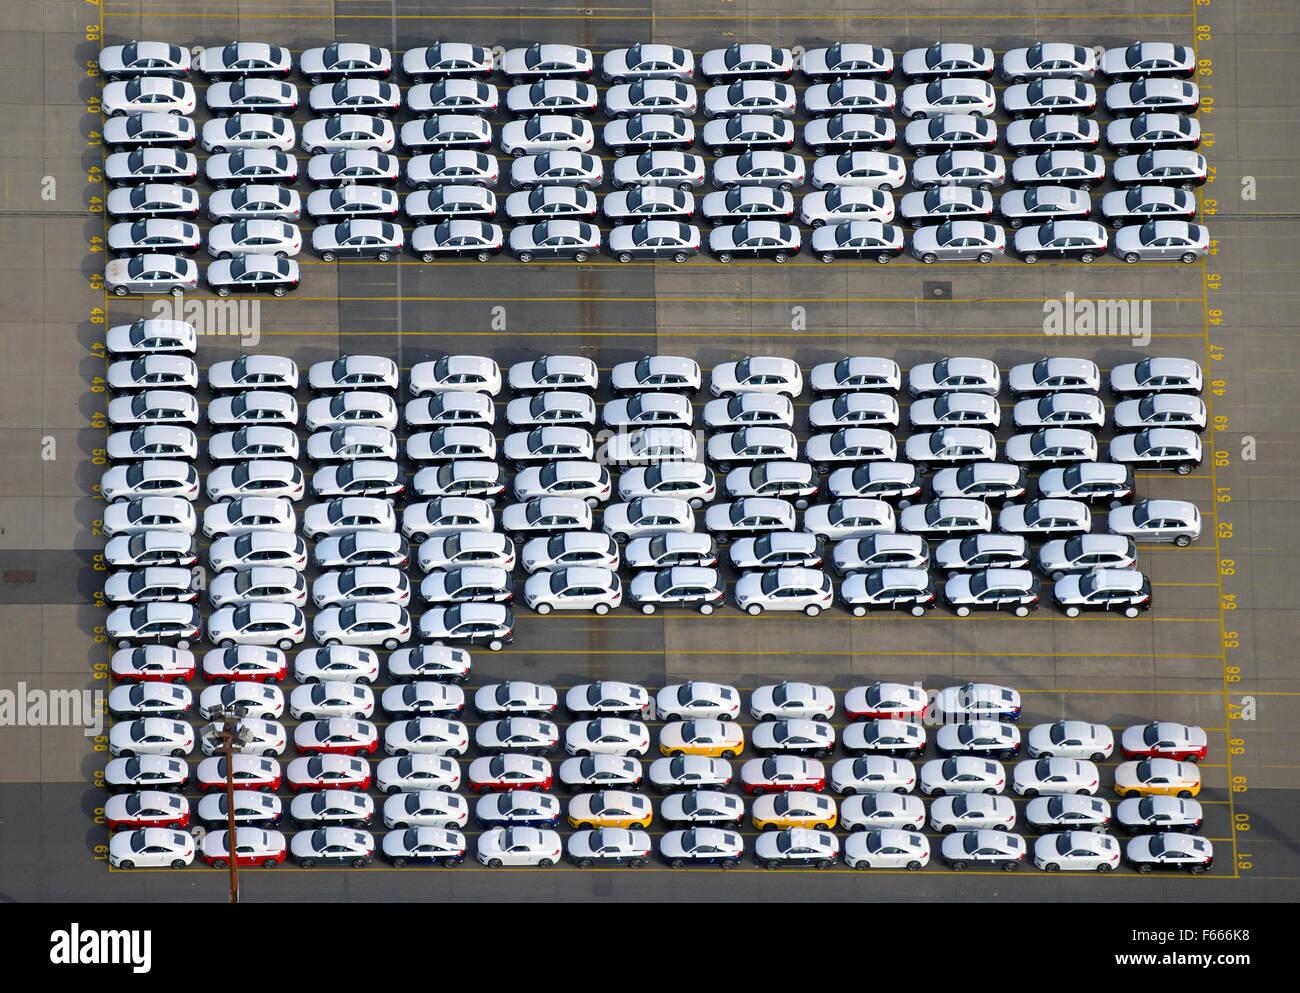 New Audi cars ready to be shipped, Uni Kai in Port of Hamburg, Hamburg, Germany - Stock Image